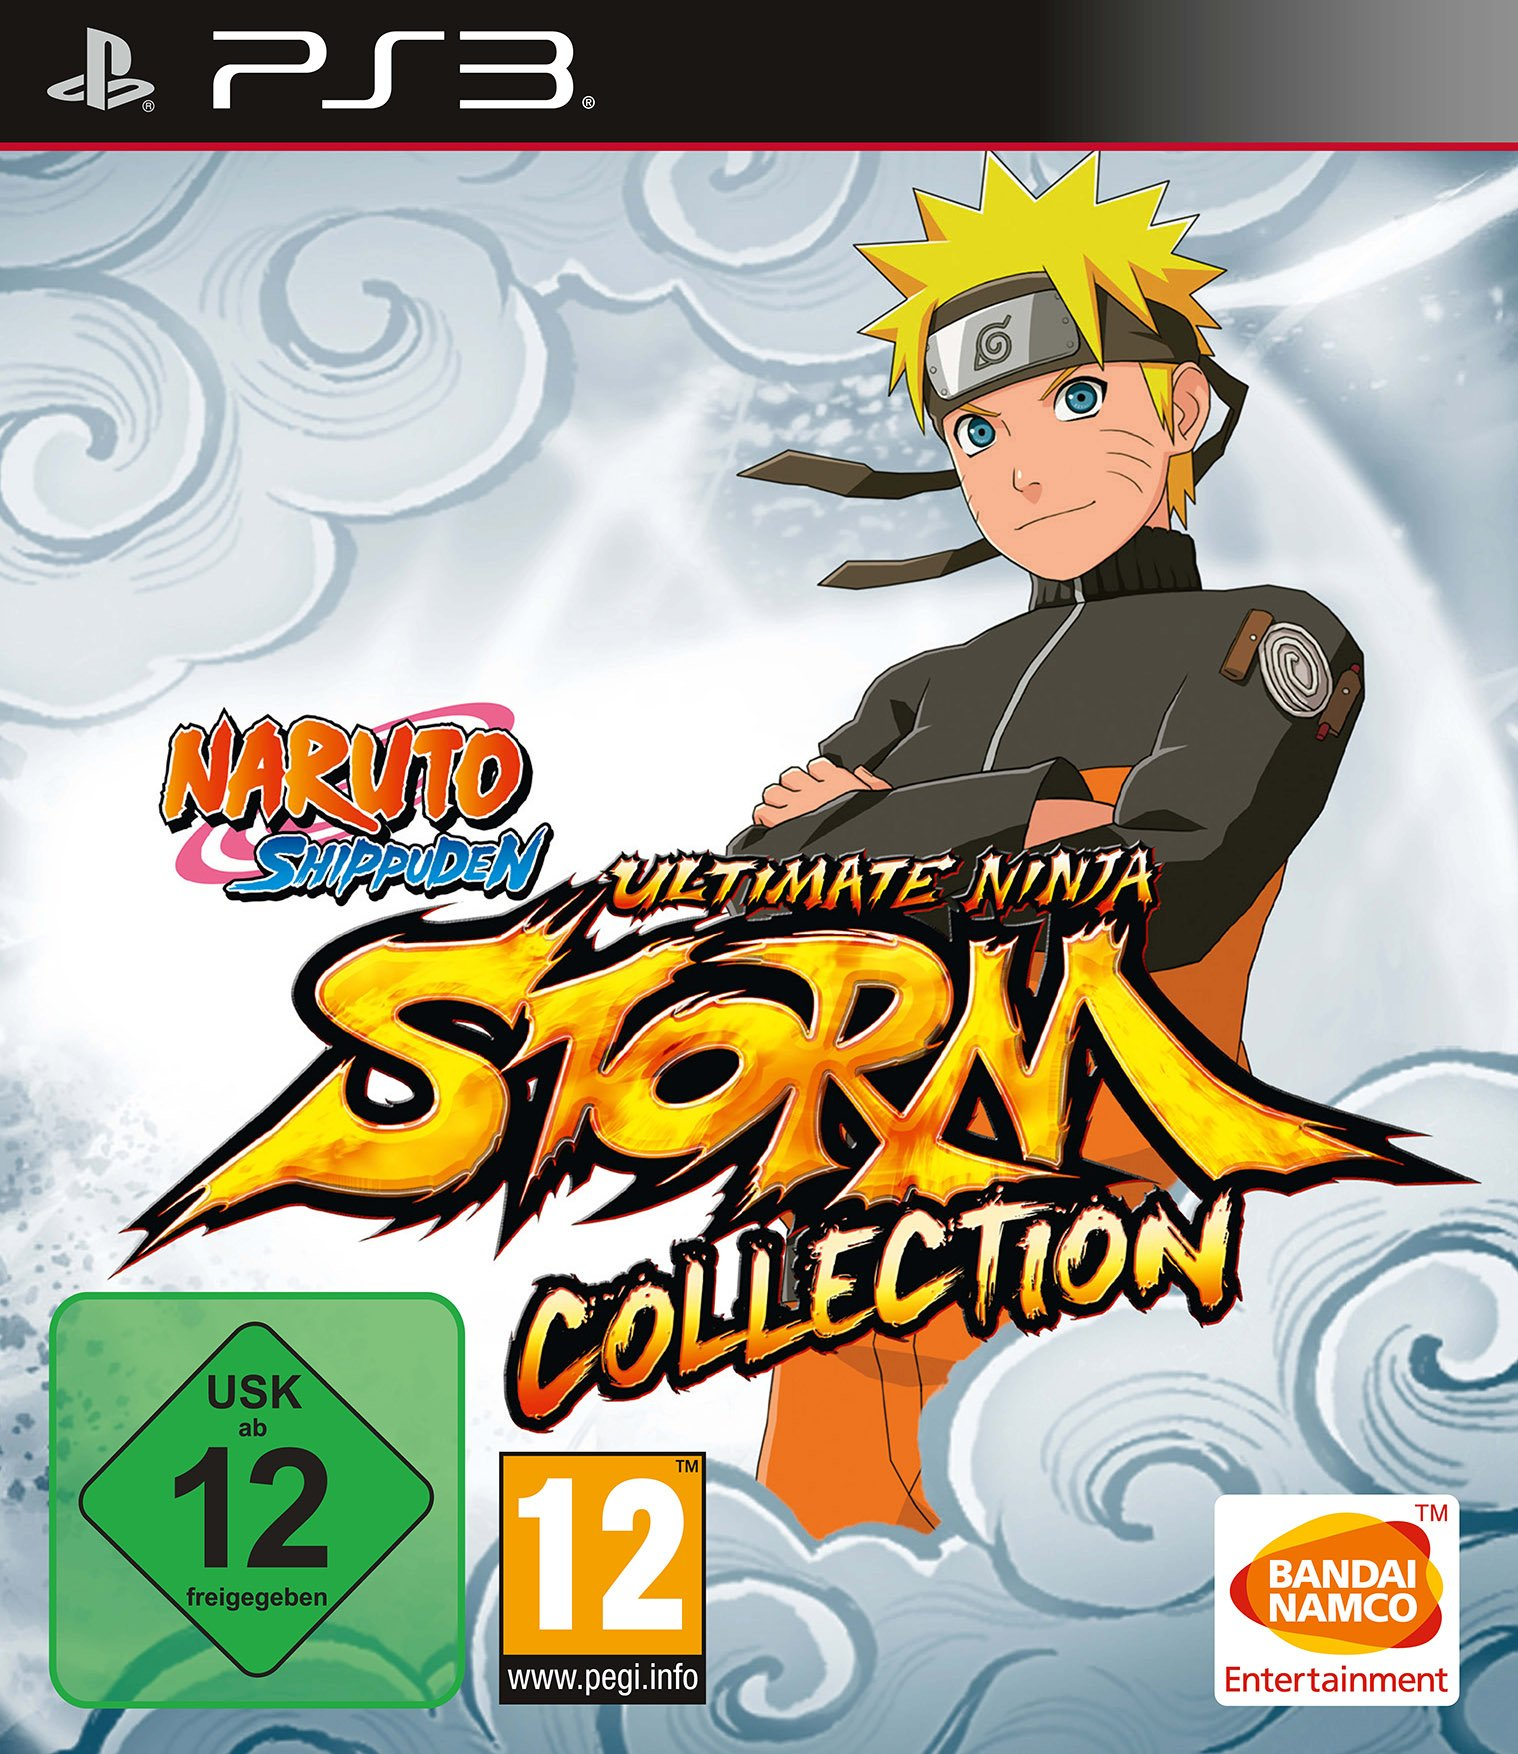 Amazon.com: Naruto Shippuden Ultimate Ninja Storm 1+2+3 Full ...